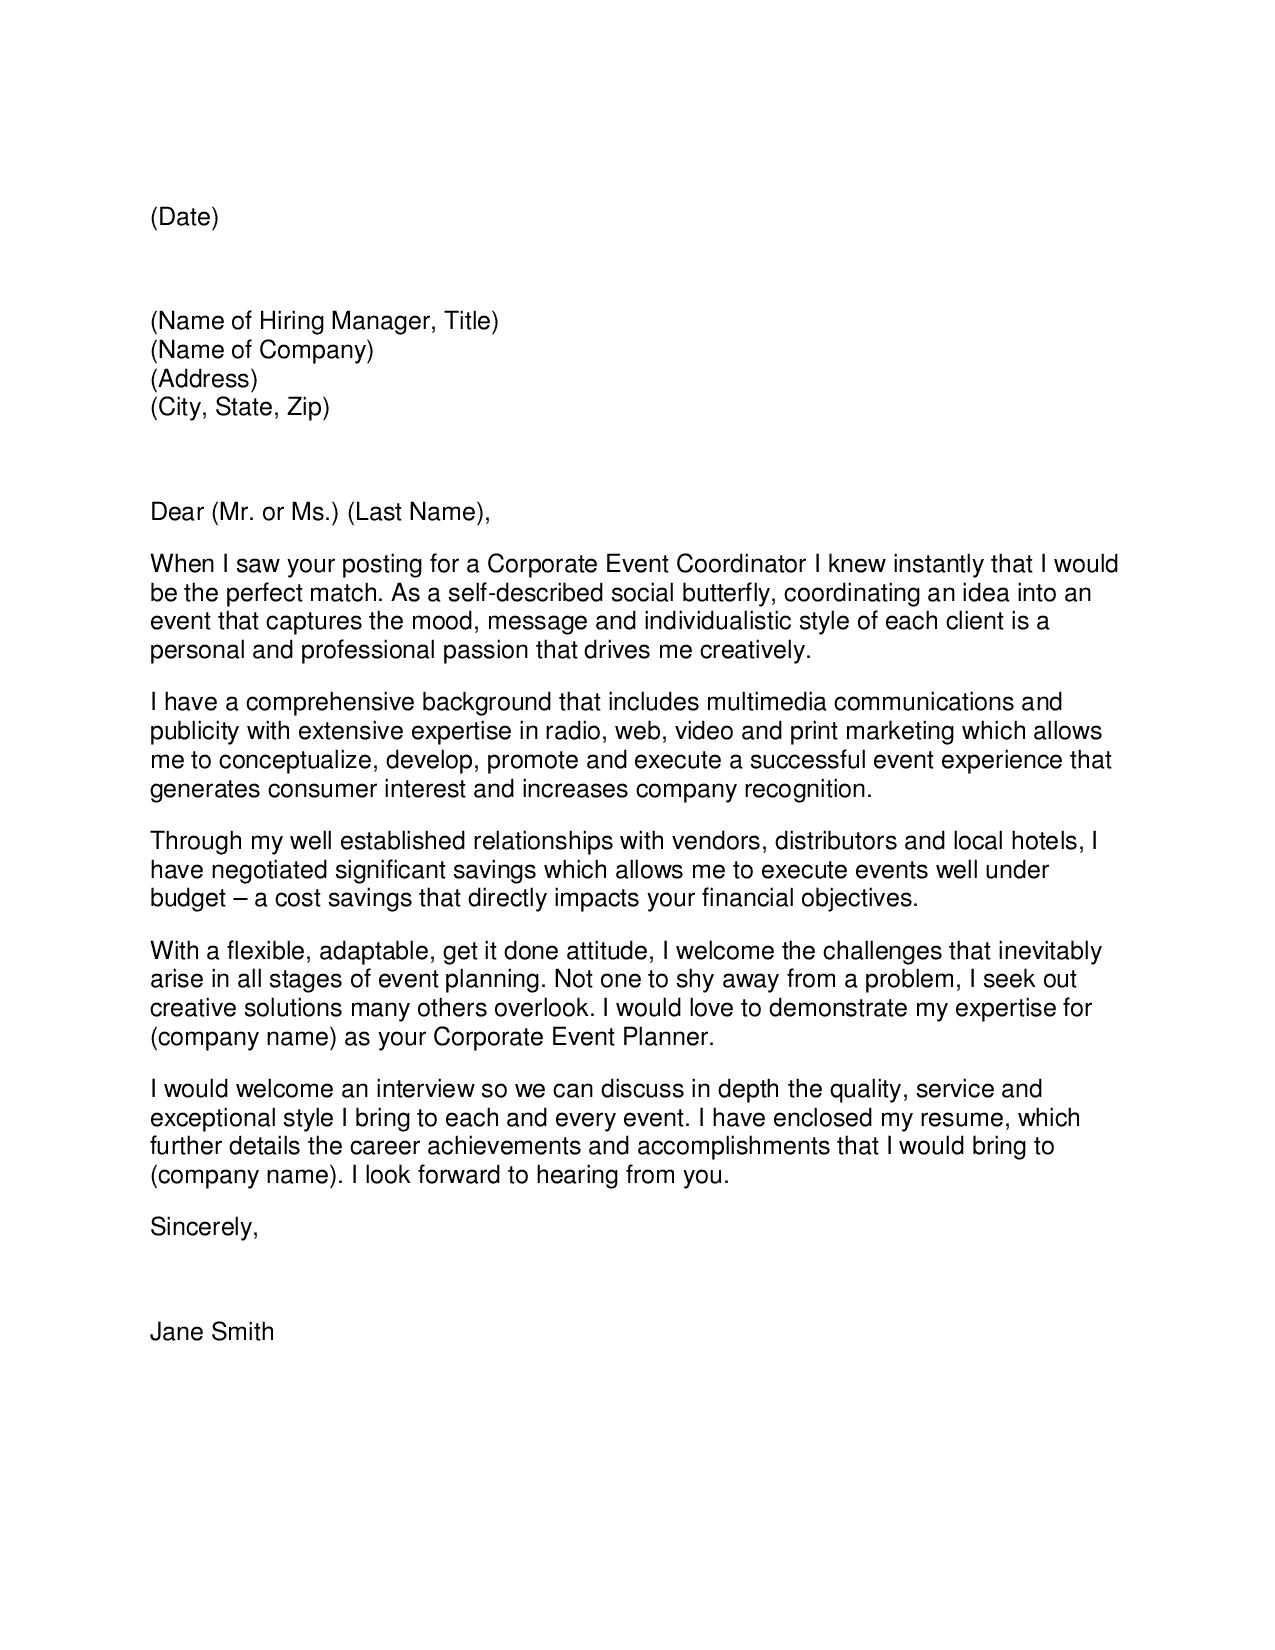 Sample Rfp Response Letter from workalpha.com